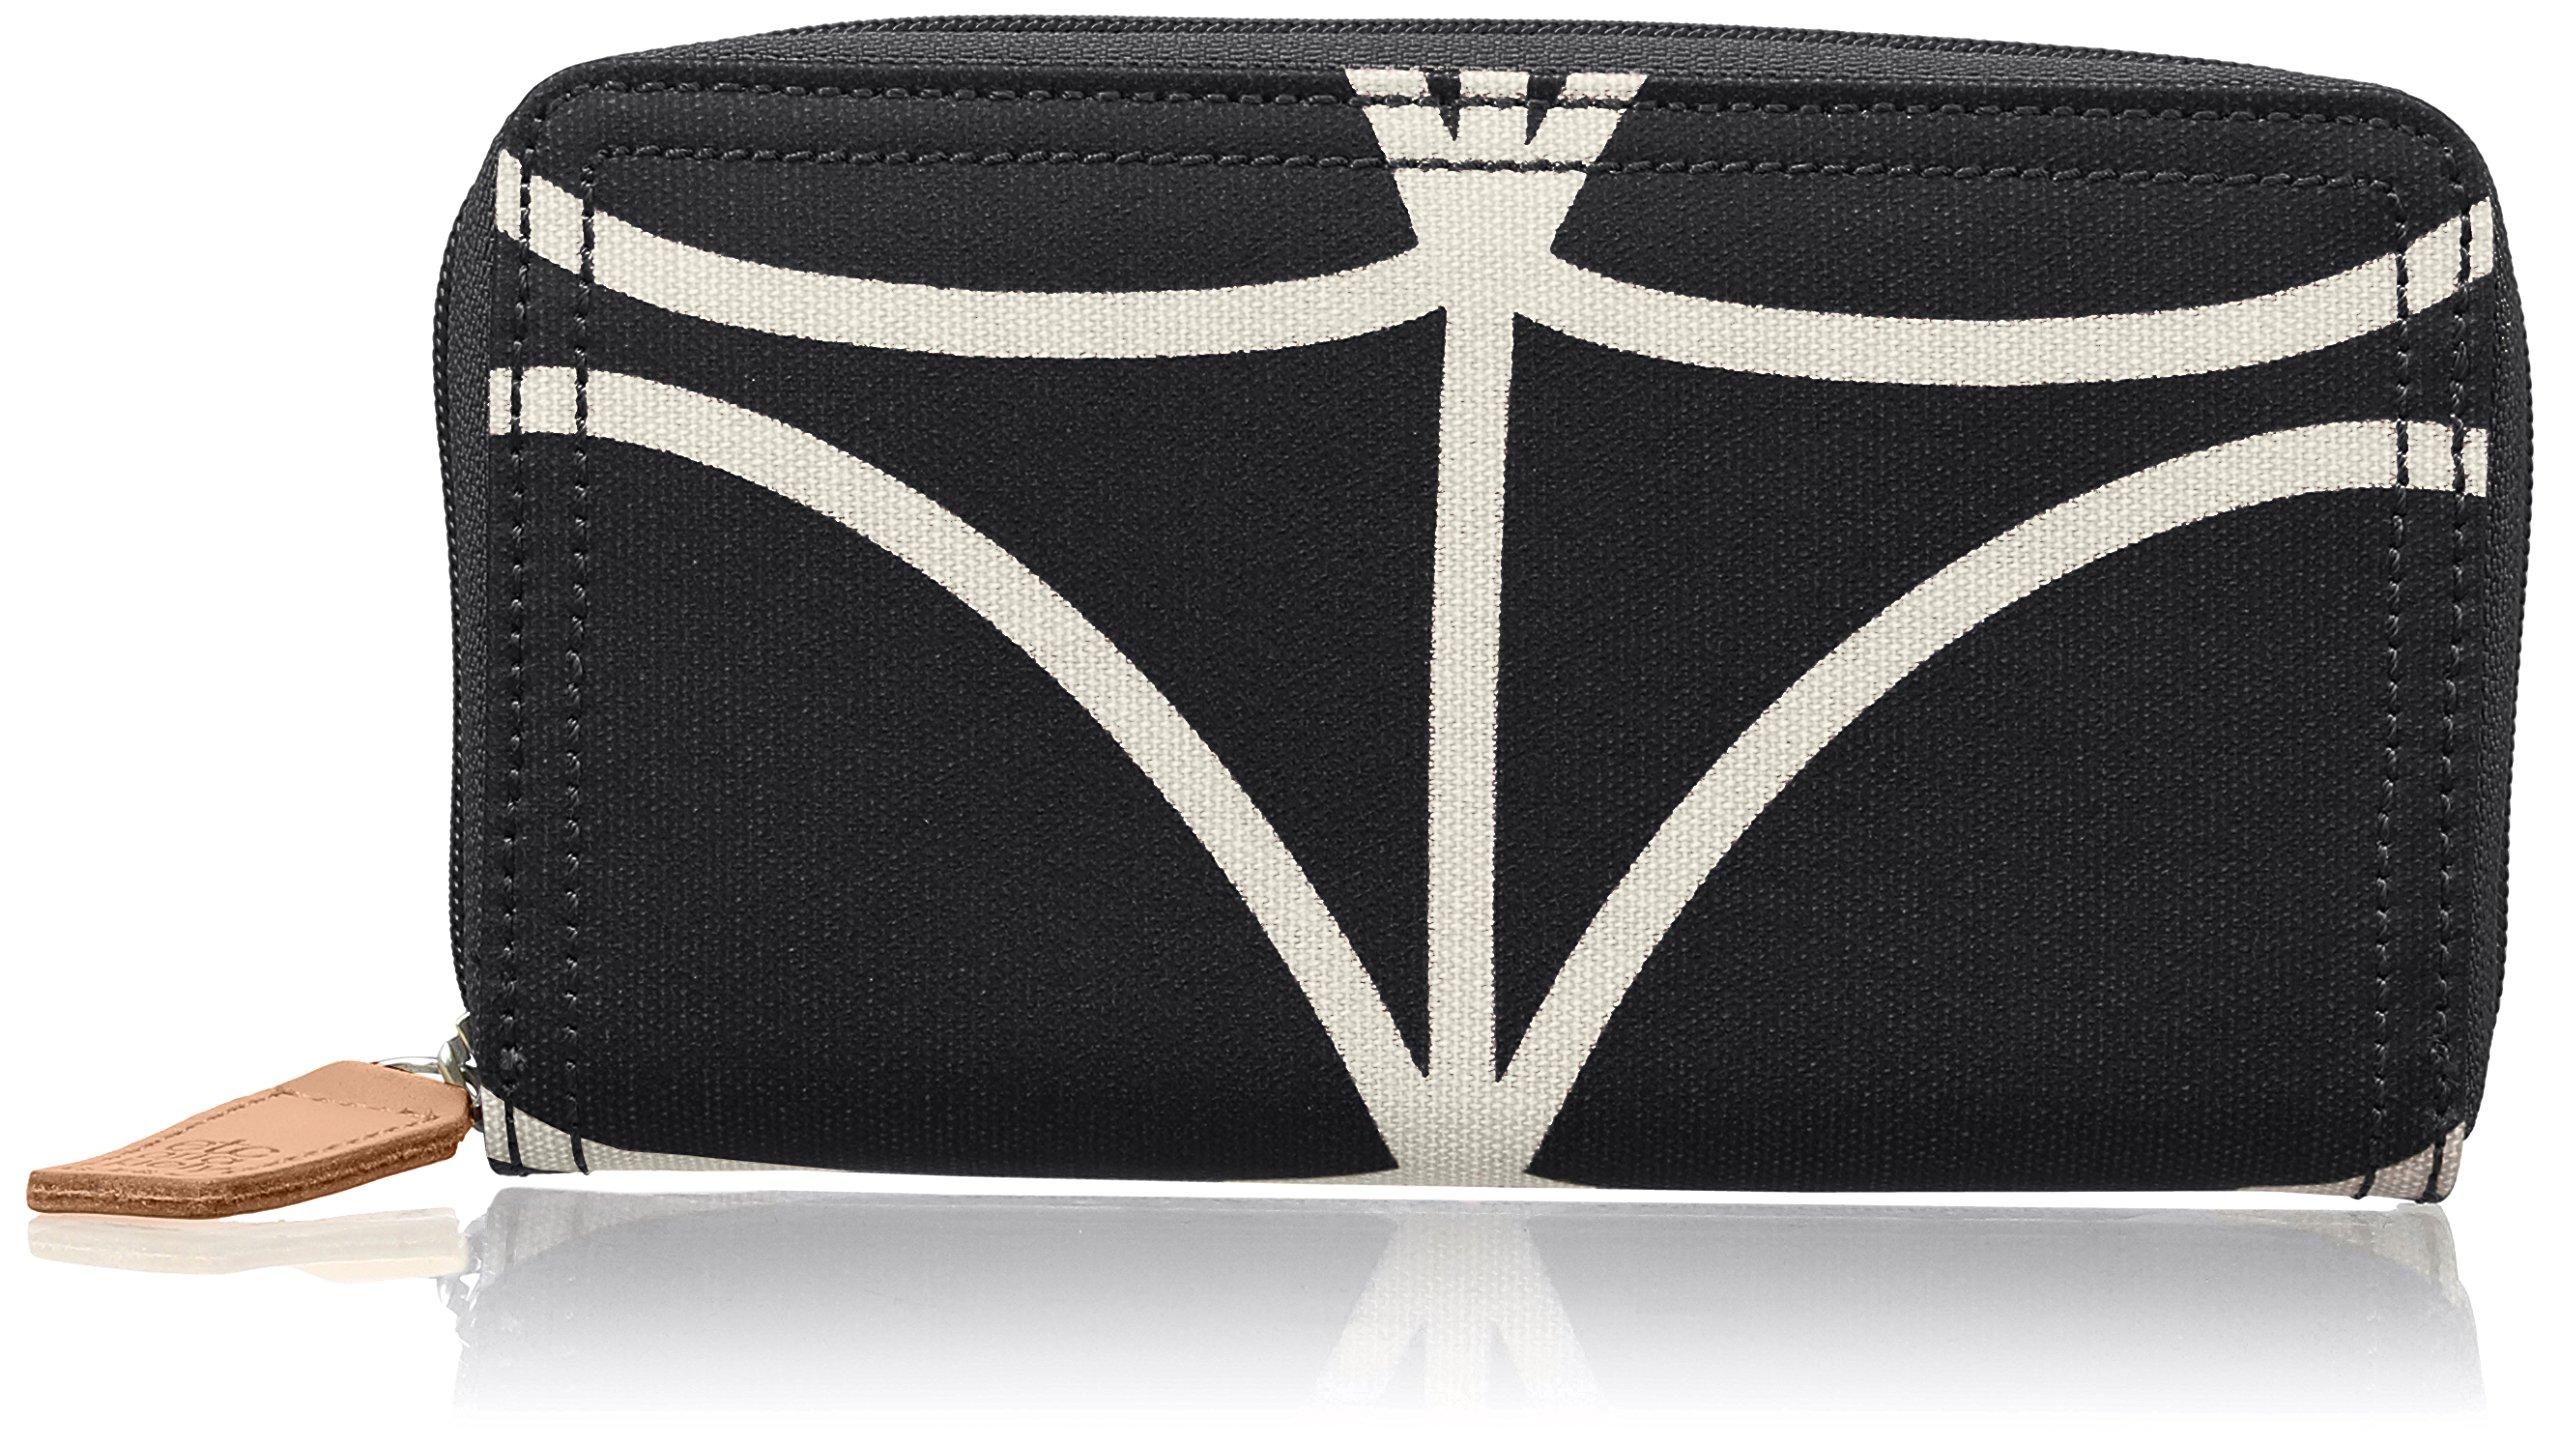 Etc Giant Linear Stem Big Zip Wallet Wallet, Black+Cream, One Size